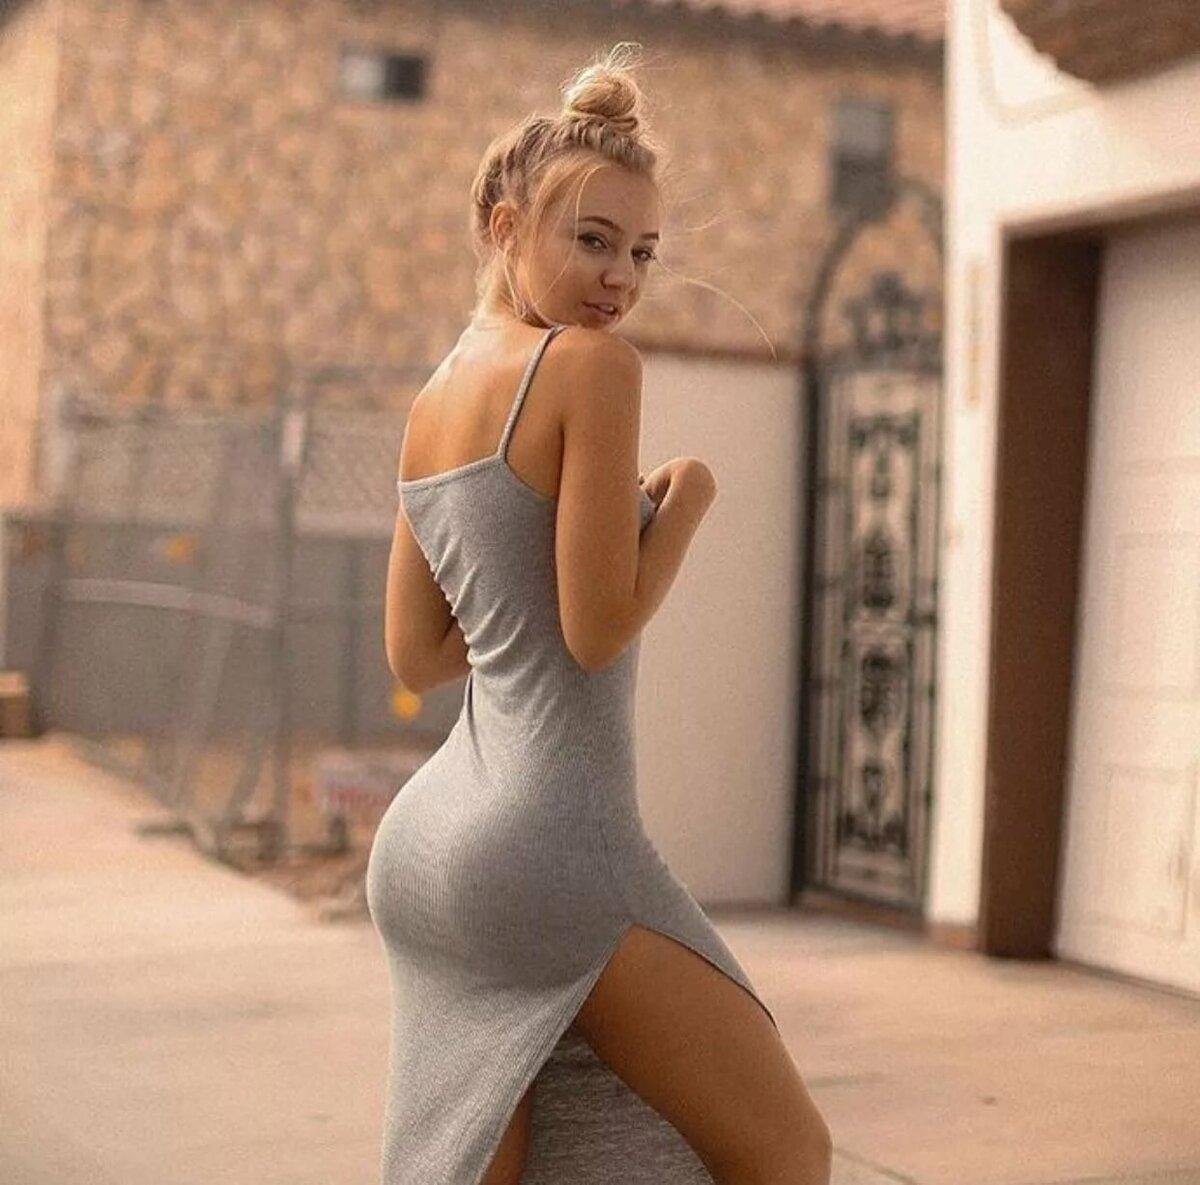 Young blond butt